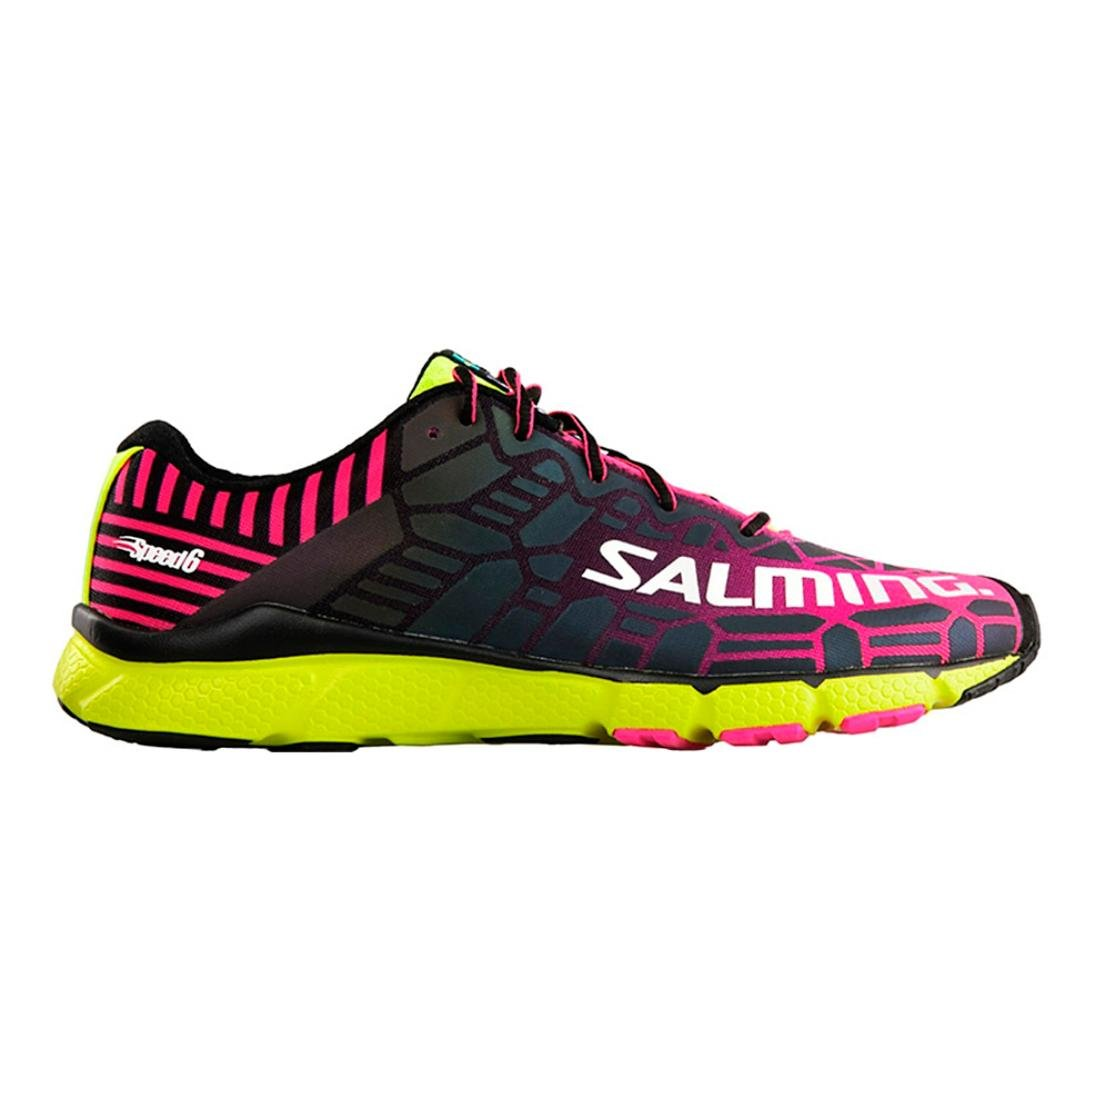 Salming Speed 6 Shoe Women Black Magenta Laufschuhe Schwarz Pink